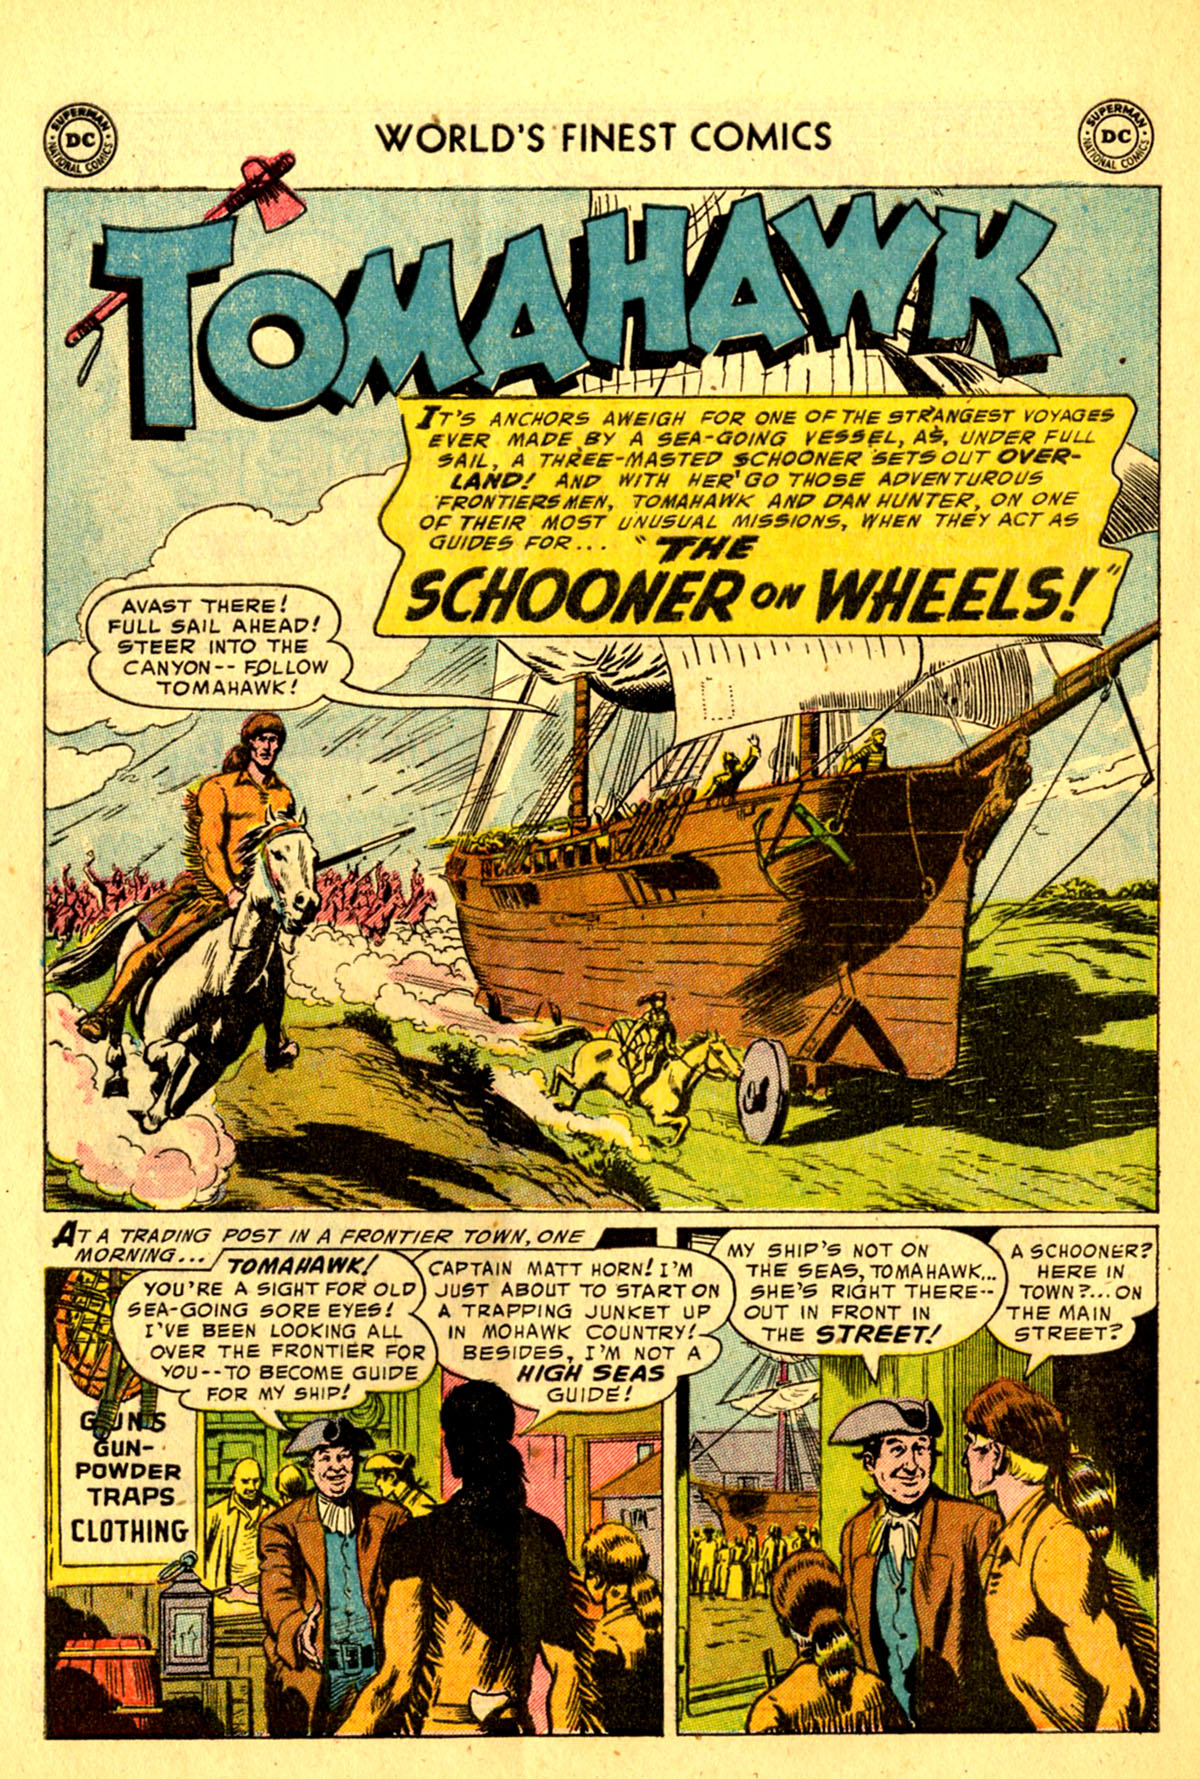 Read online World's Finest Comics comic -  Issue #76 - 28